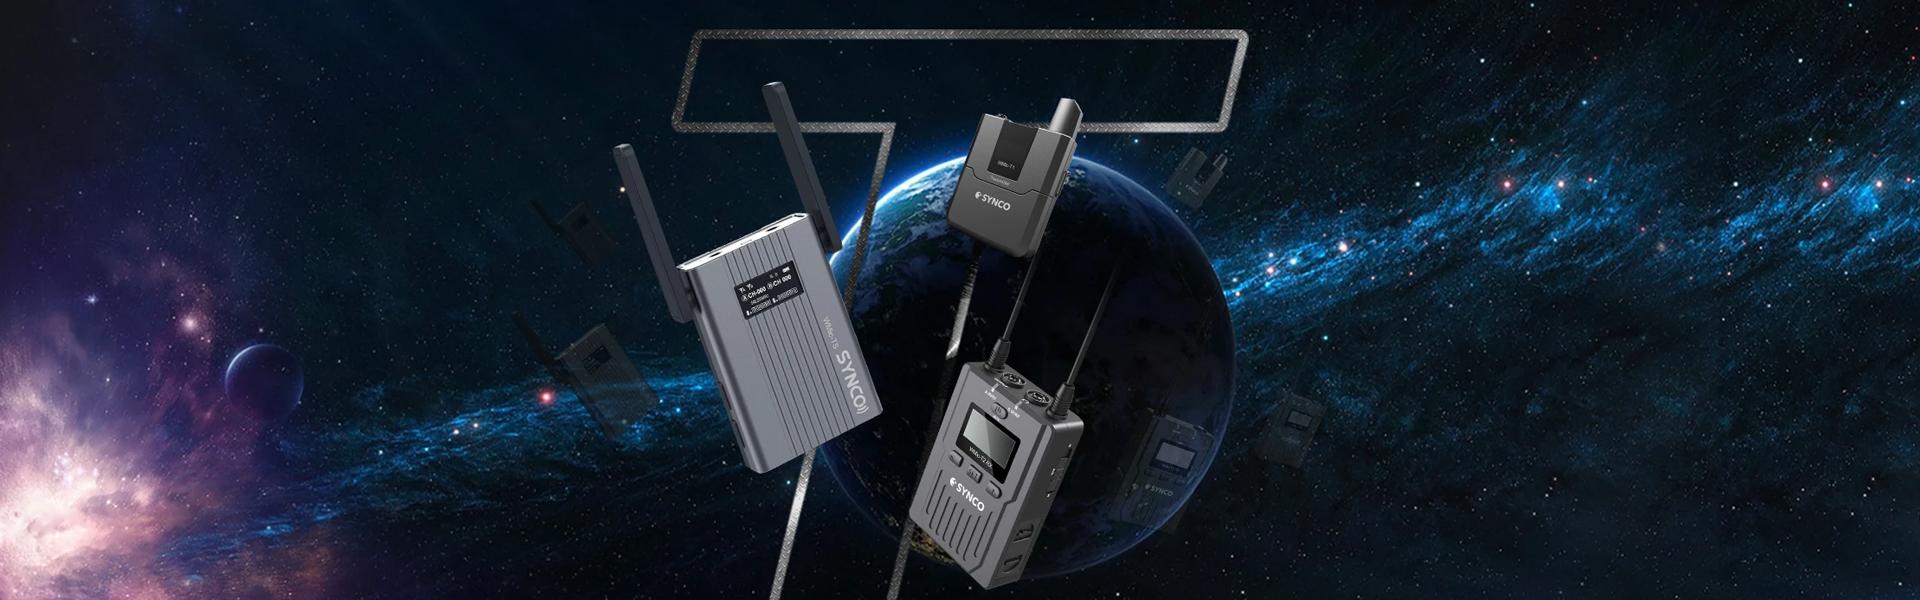 T Series UHF Wireless